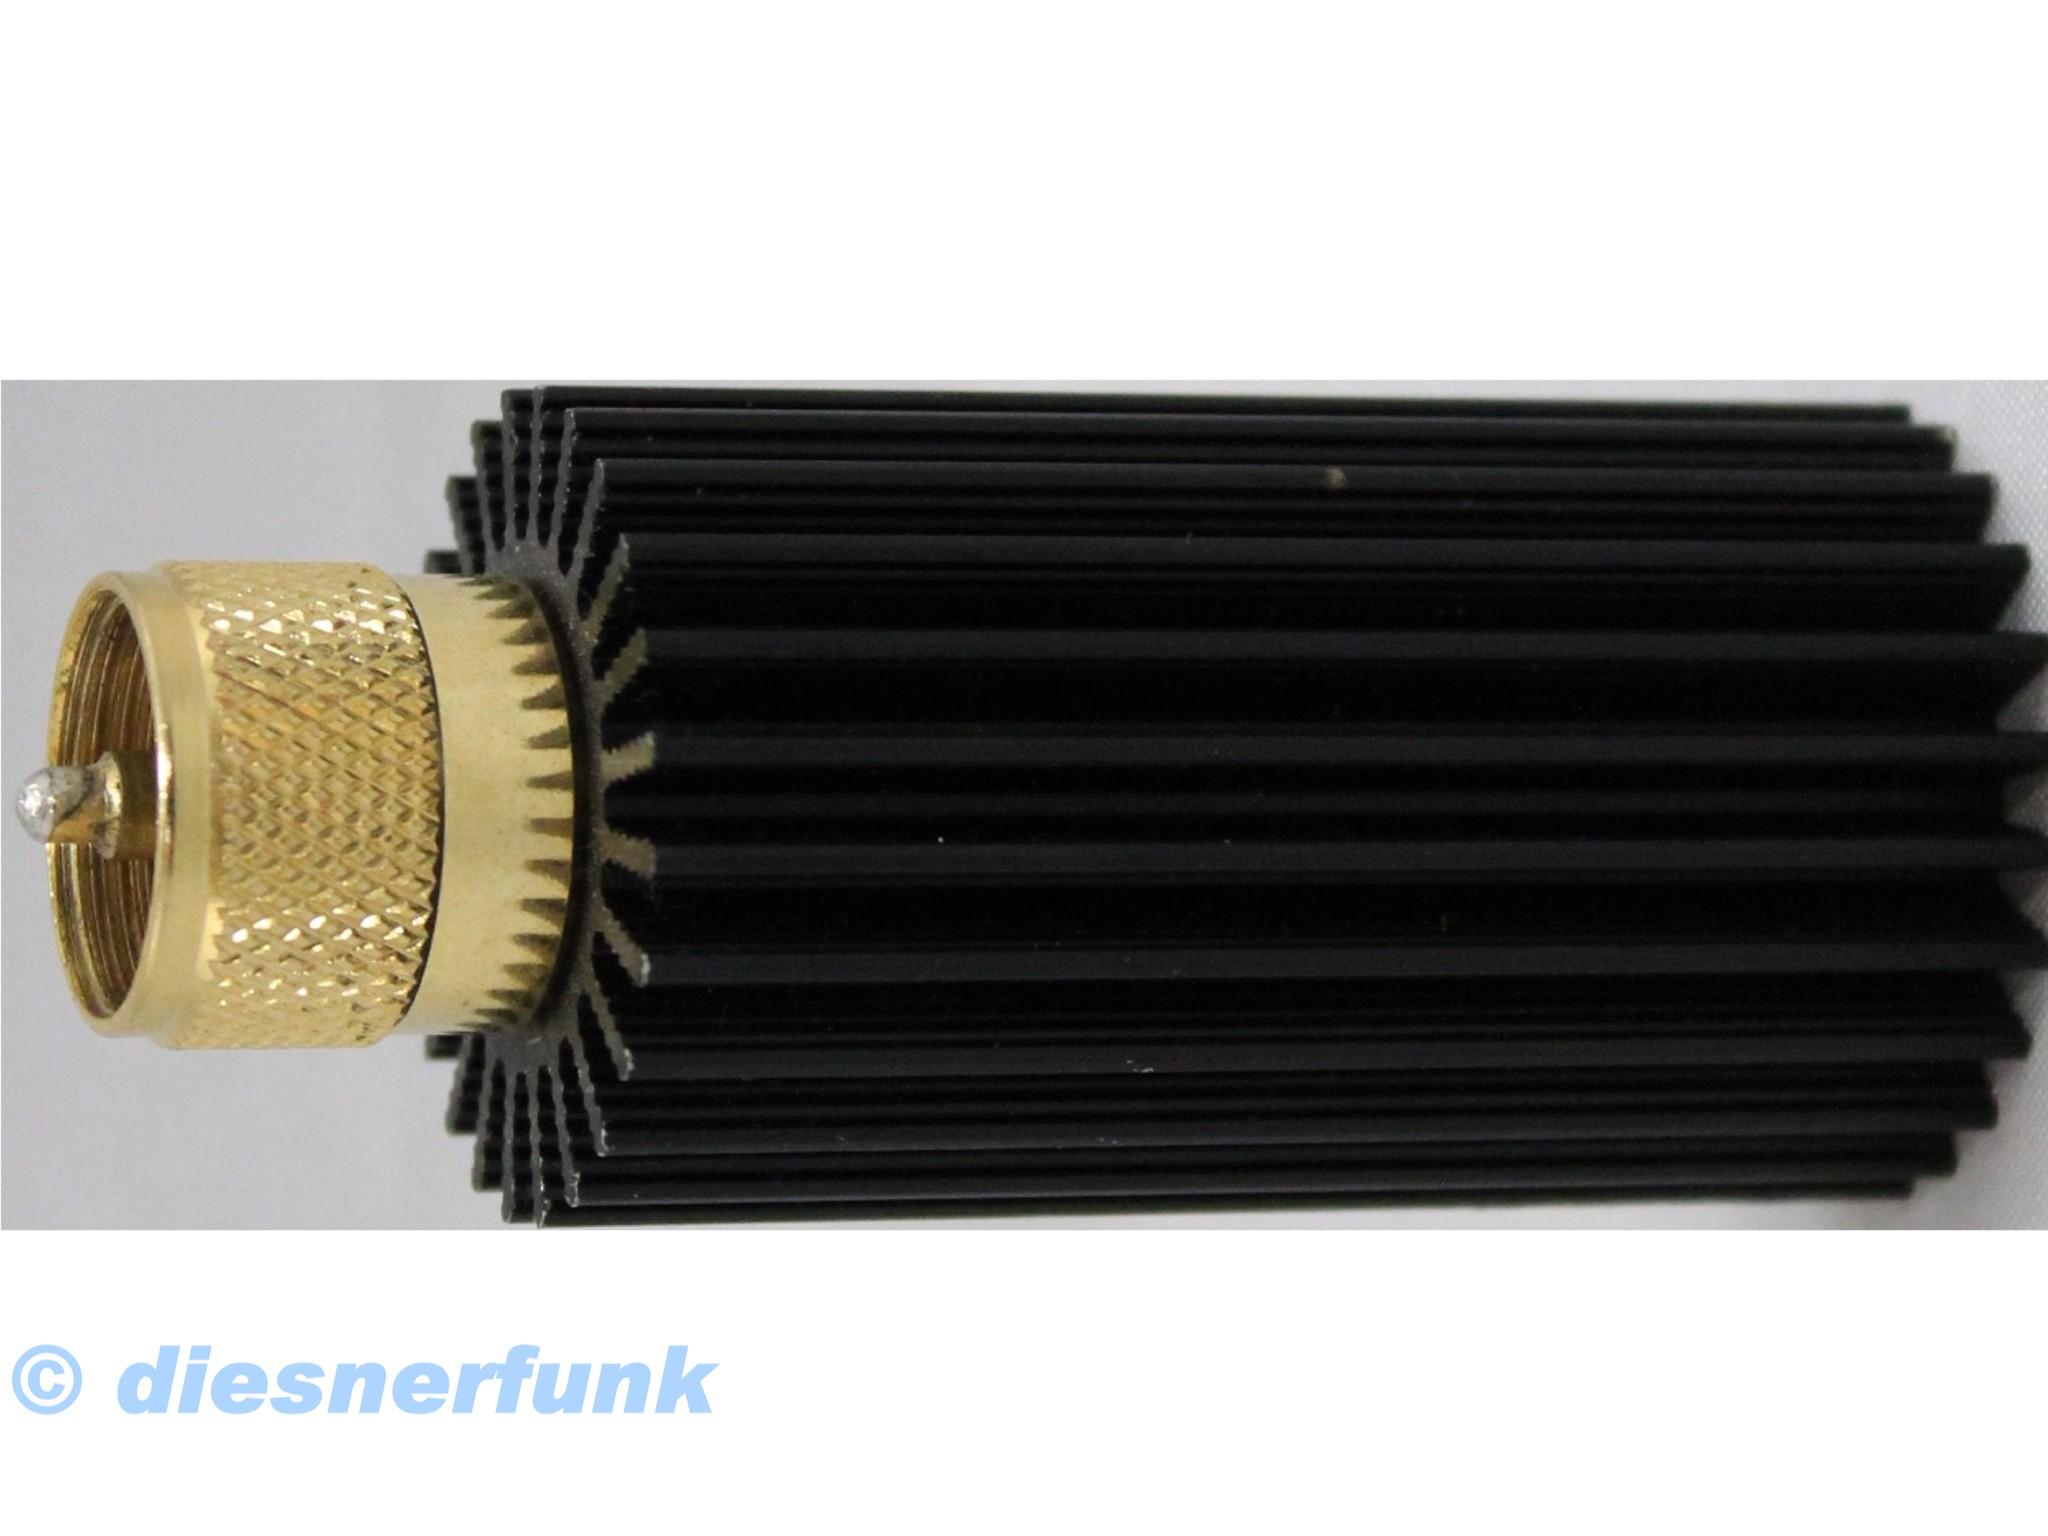 cb funk dummy load albrecht dl20 60watt bis 500mhz. Black Bedroom Furniture Sets. Home Design Ideas